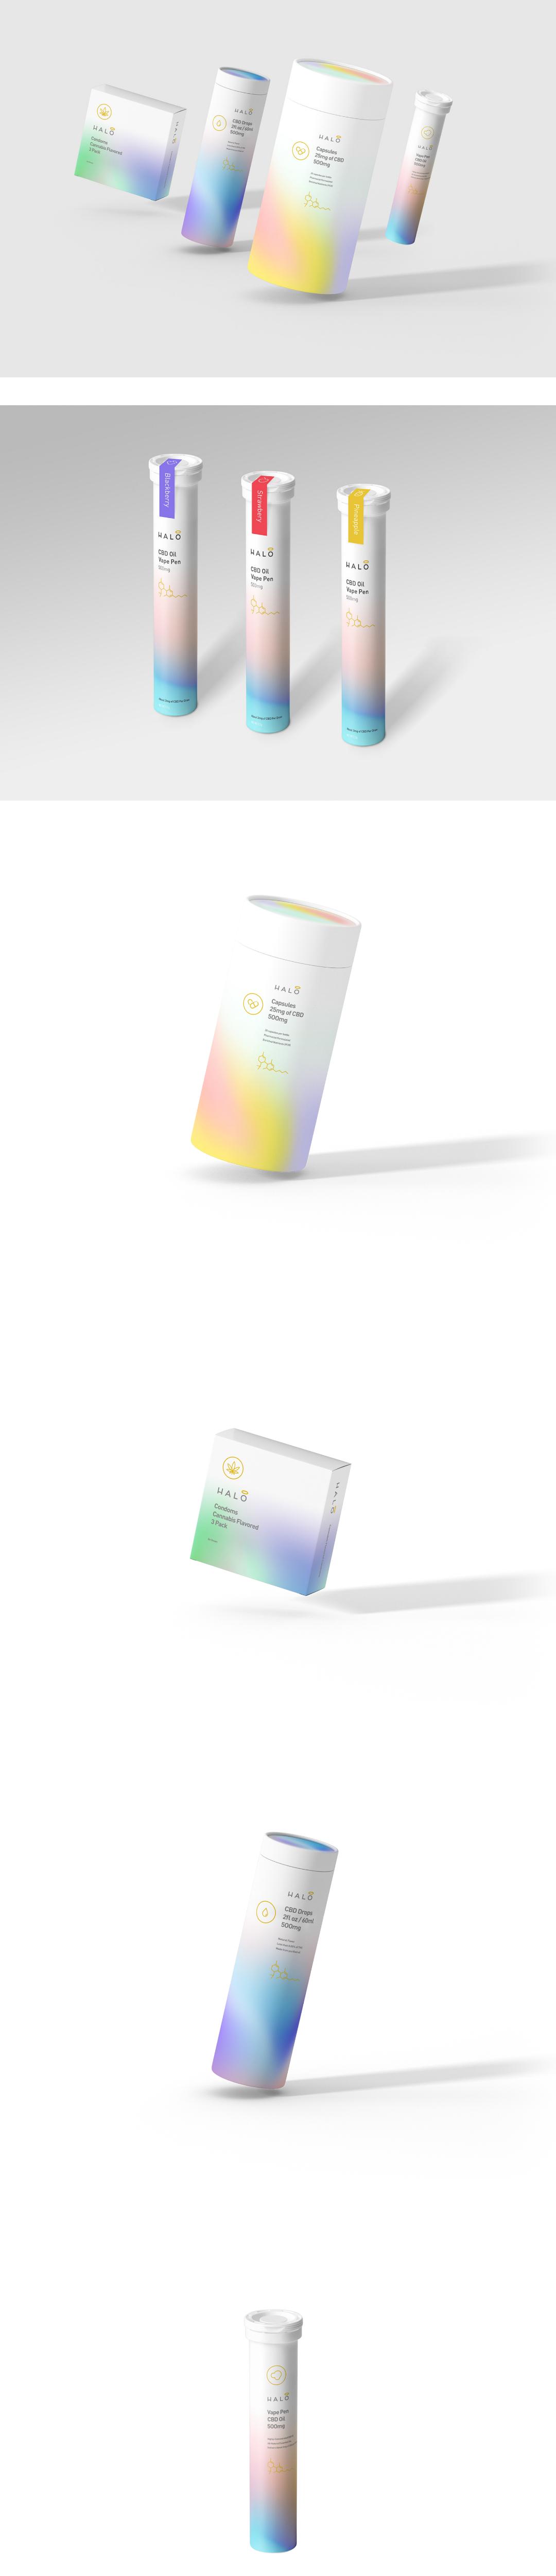 Graphic Design,Packaging,Branding